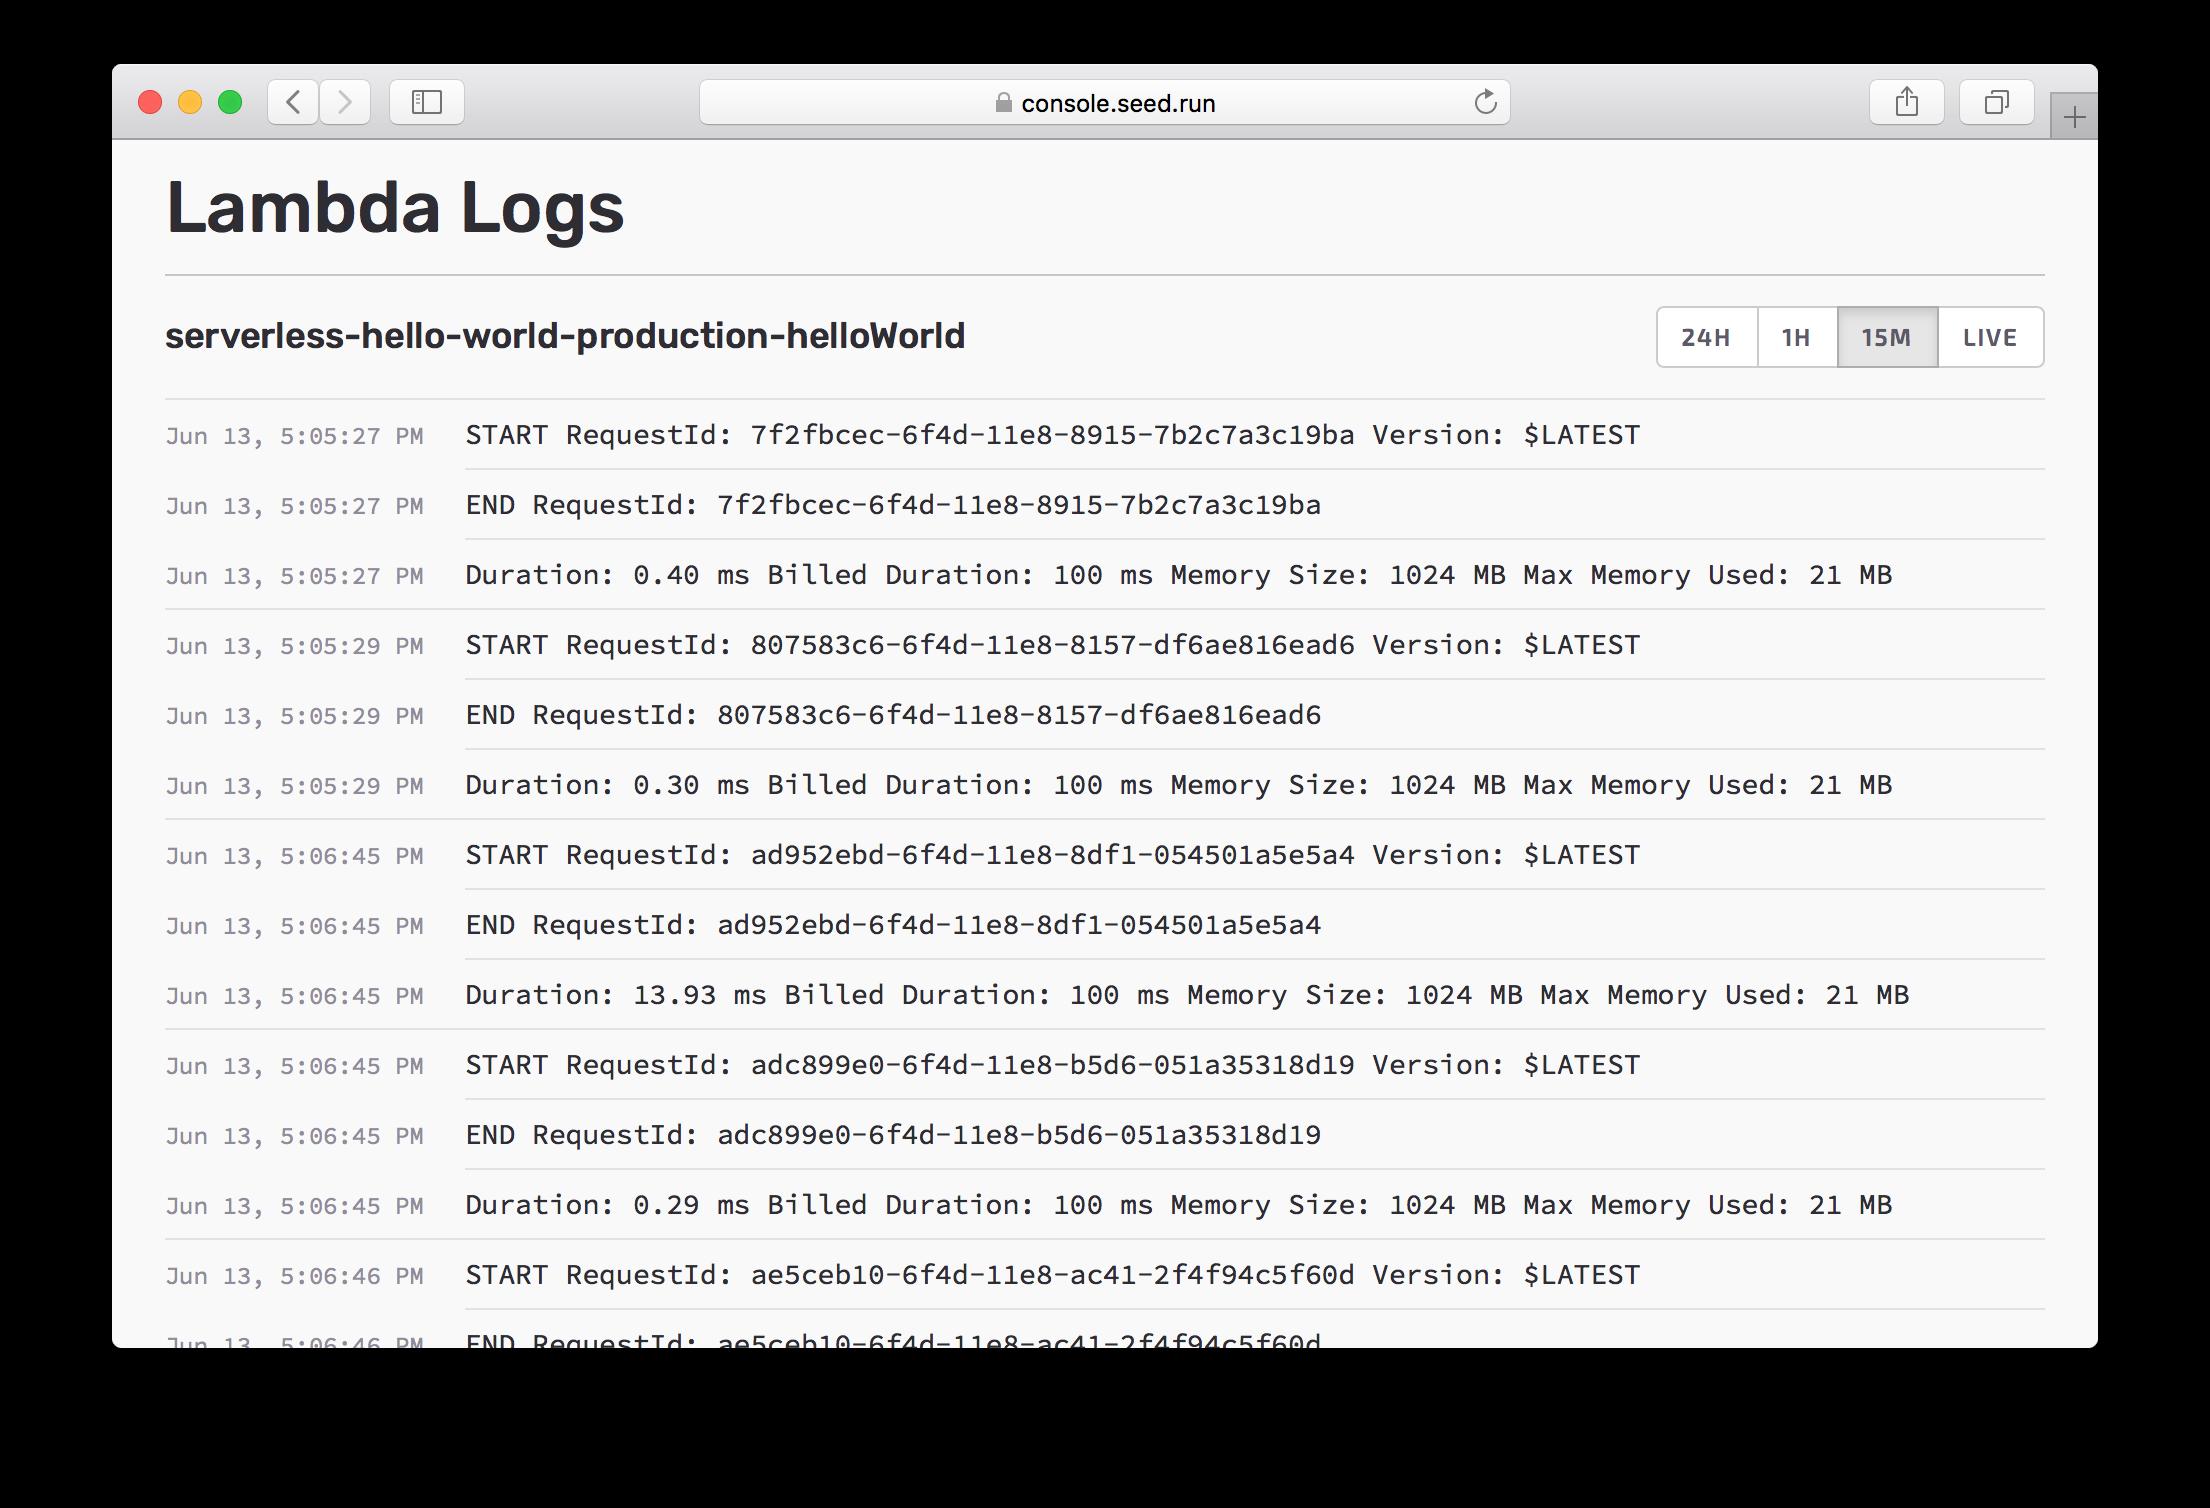 Lambda Logs